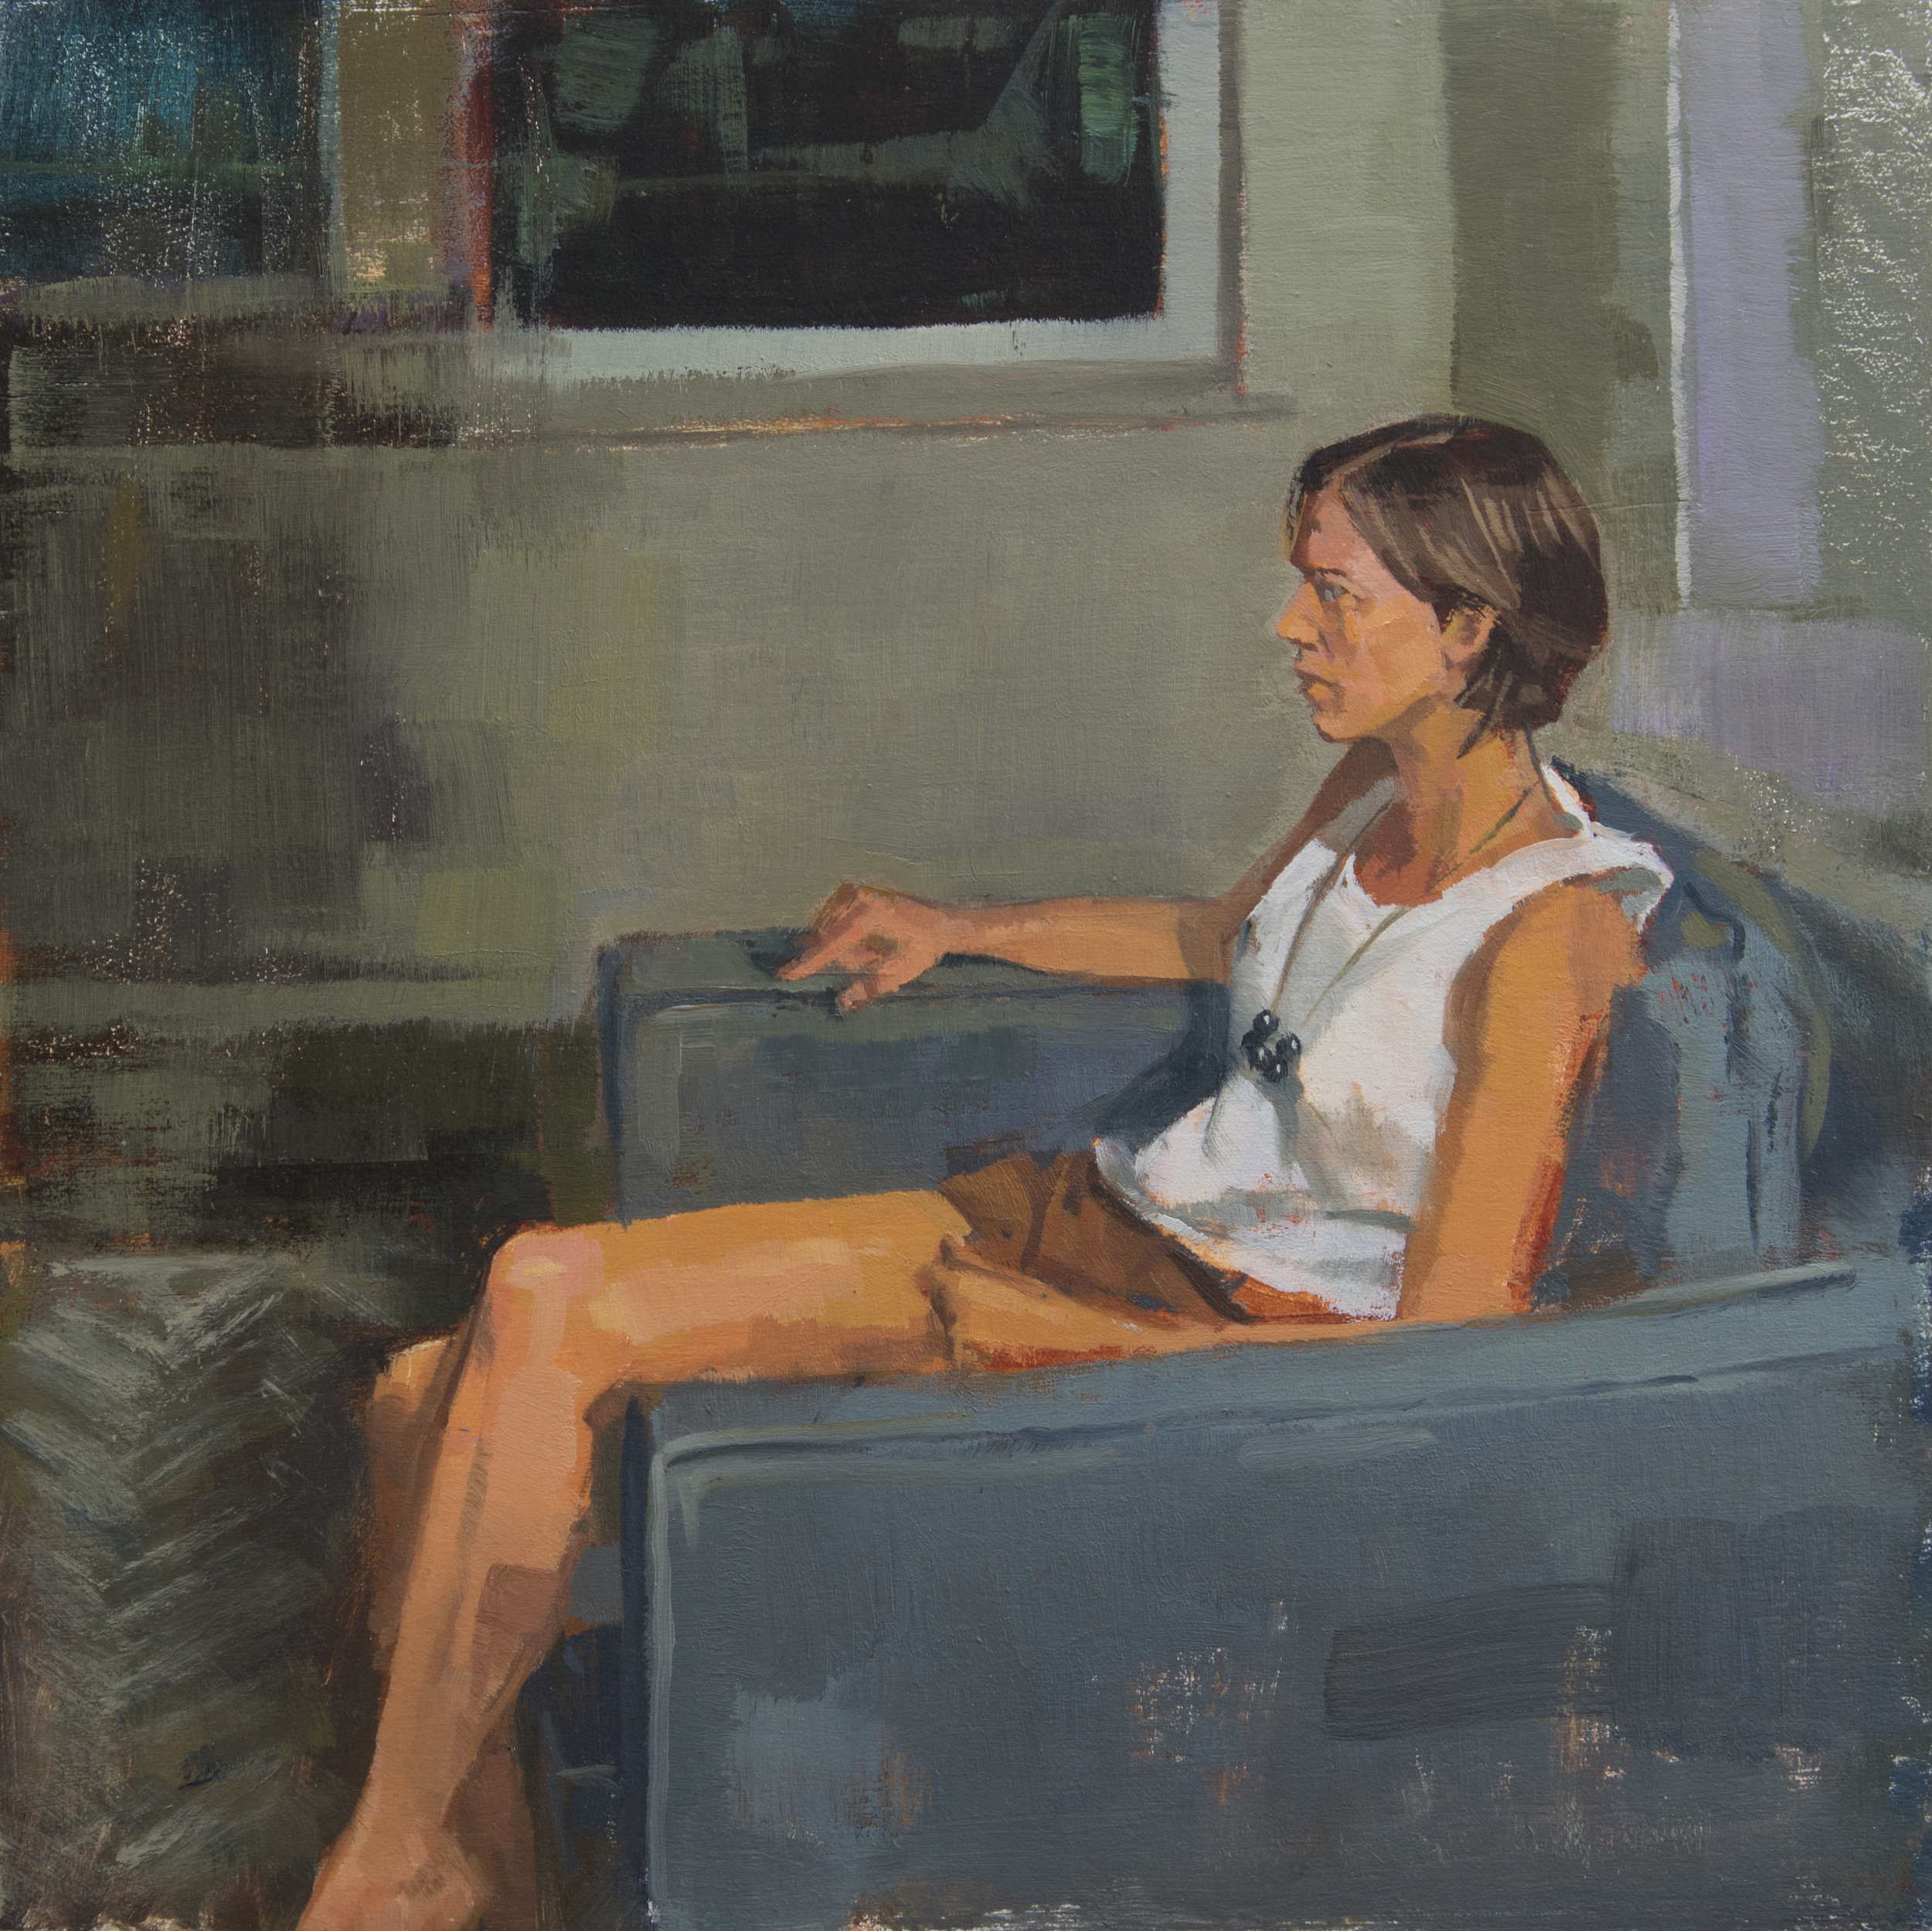 "Familiar Gazing, oil on panel, 10"" x 10"", 2016"